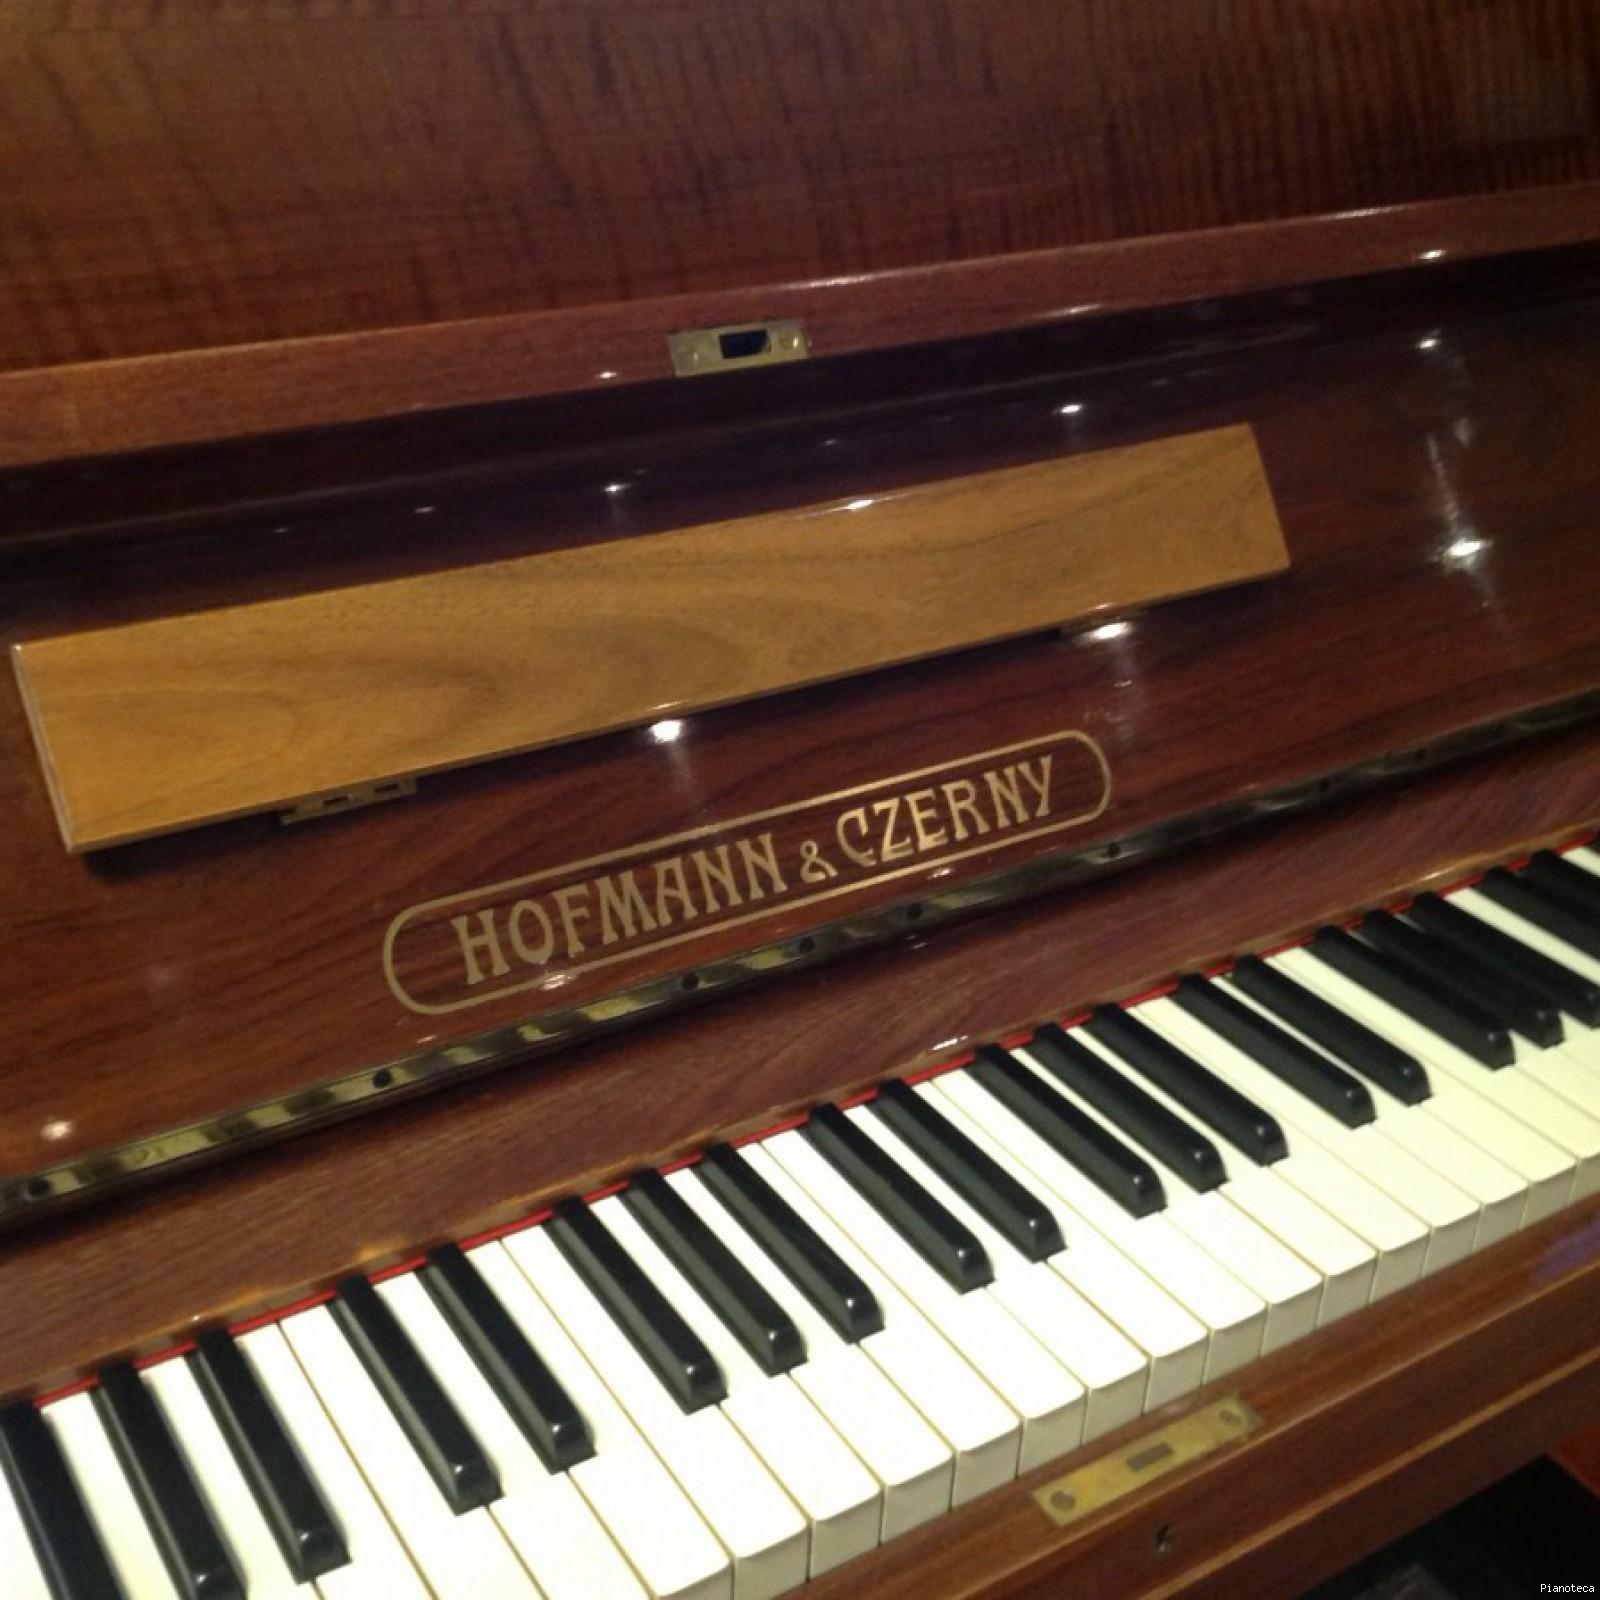 Hofmann & Czerny Pianos Information | Roberts Pianos - Oxford